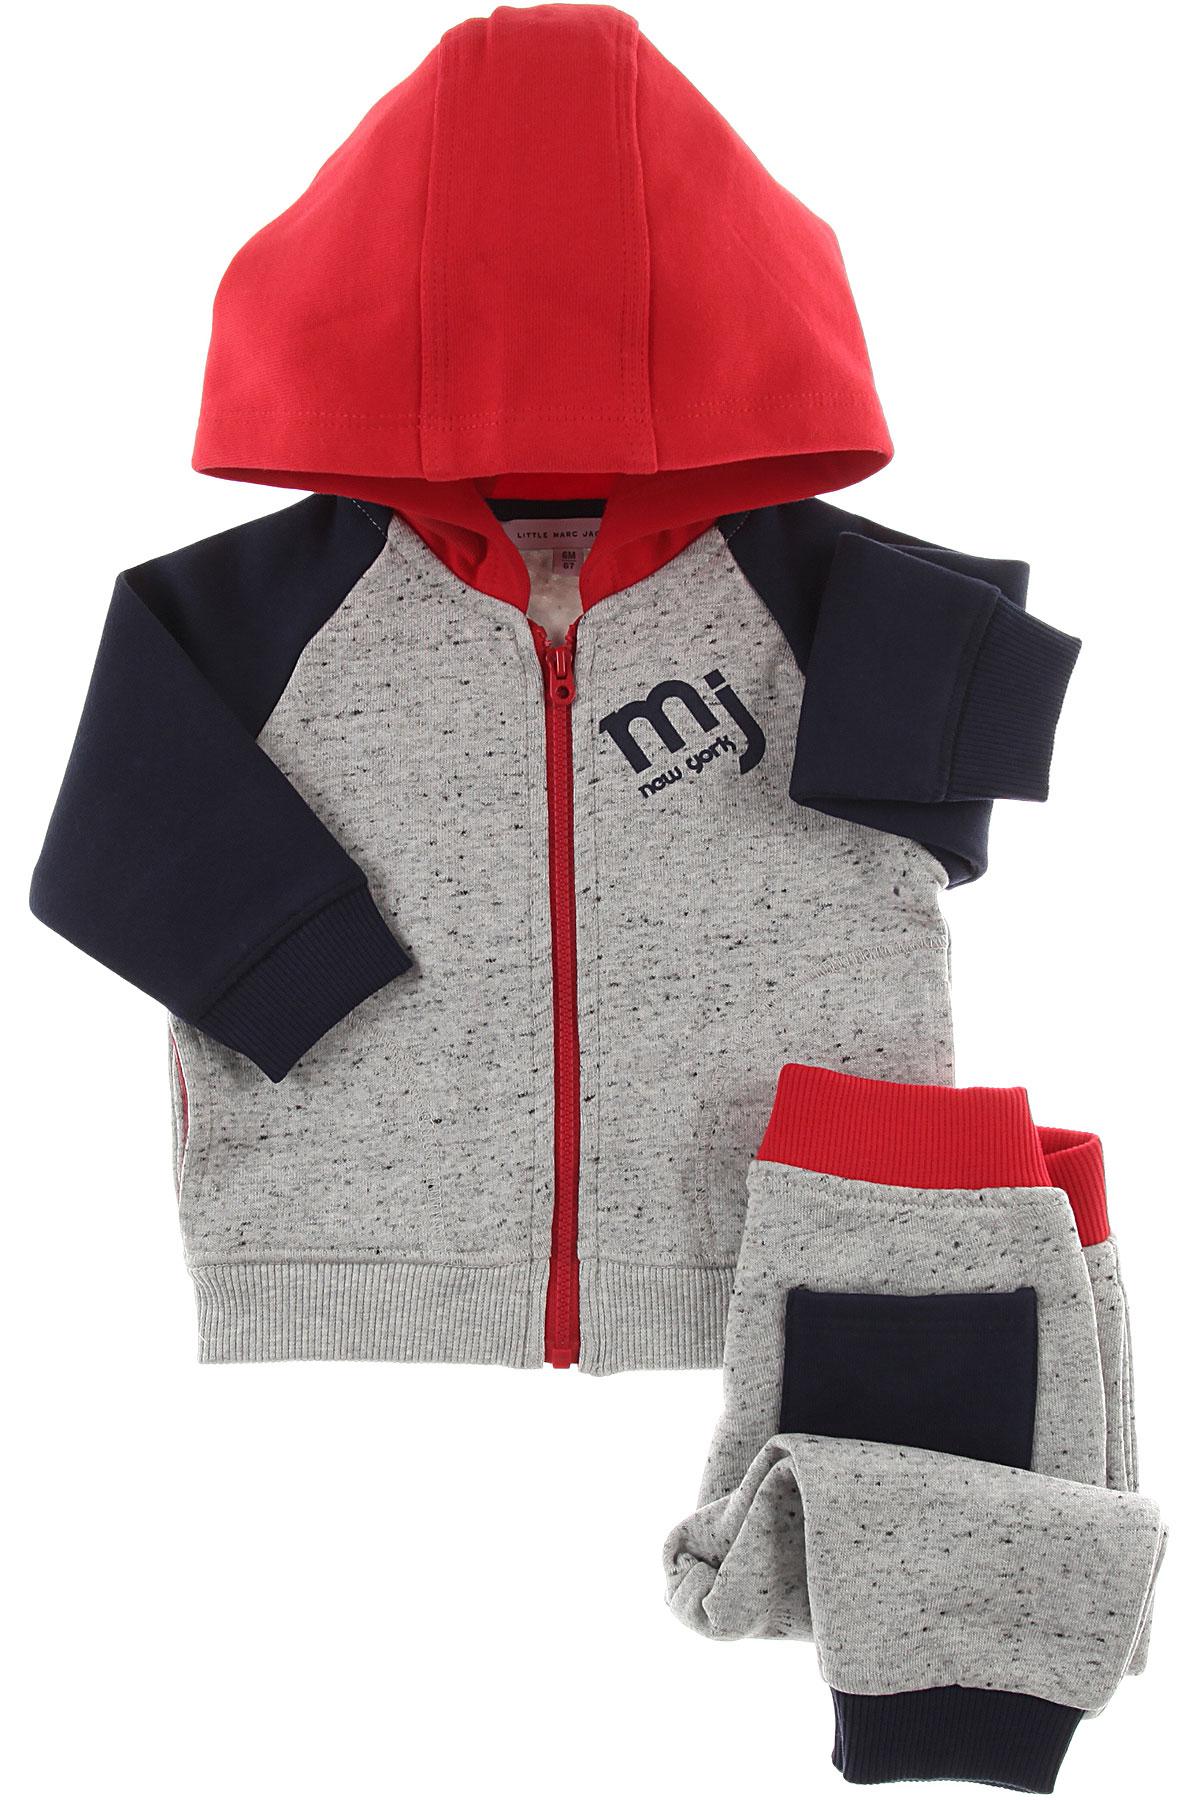 Image of Marc Jacobs Baby Sweatshirts & Hoodies for Boys, Grey Melange, Cotton, 2017, 12M 18M 2Y 3Y 6M 9M